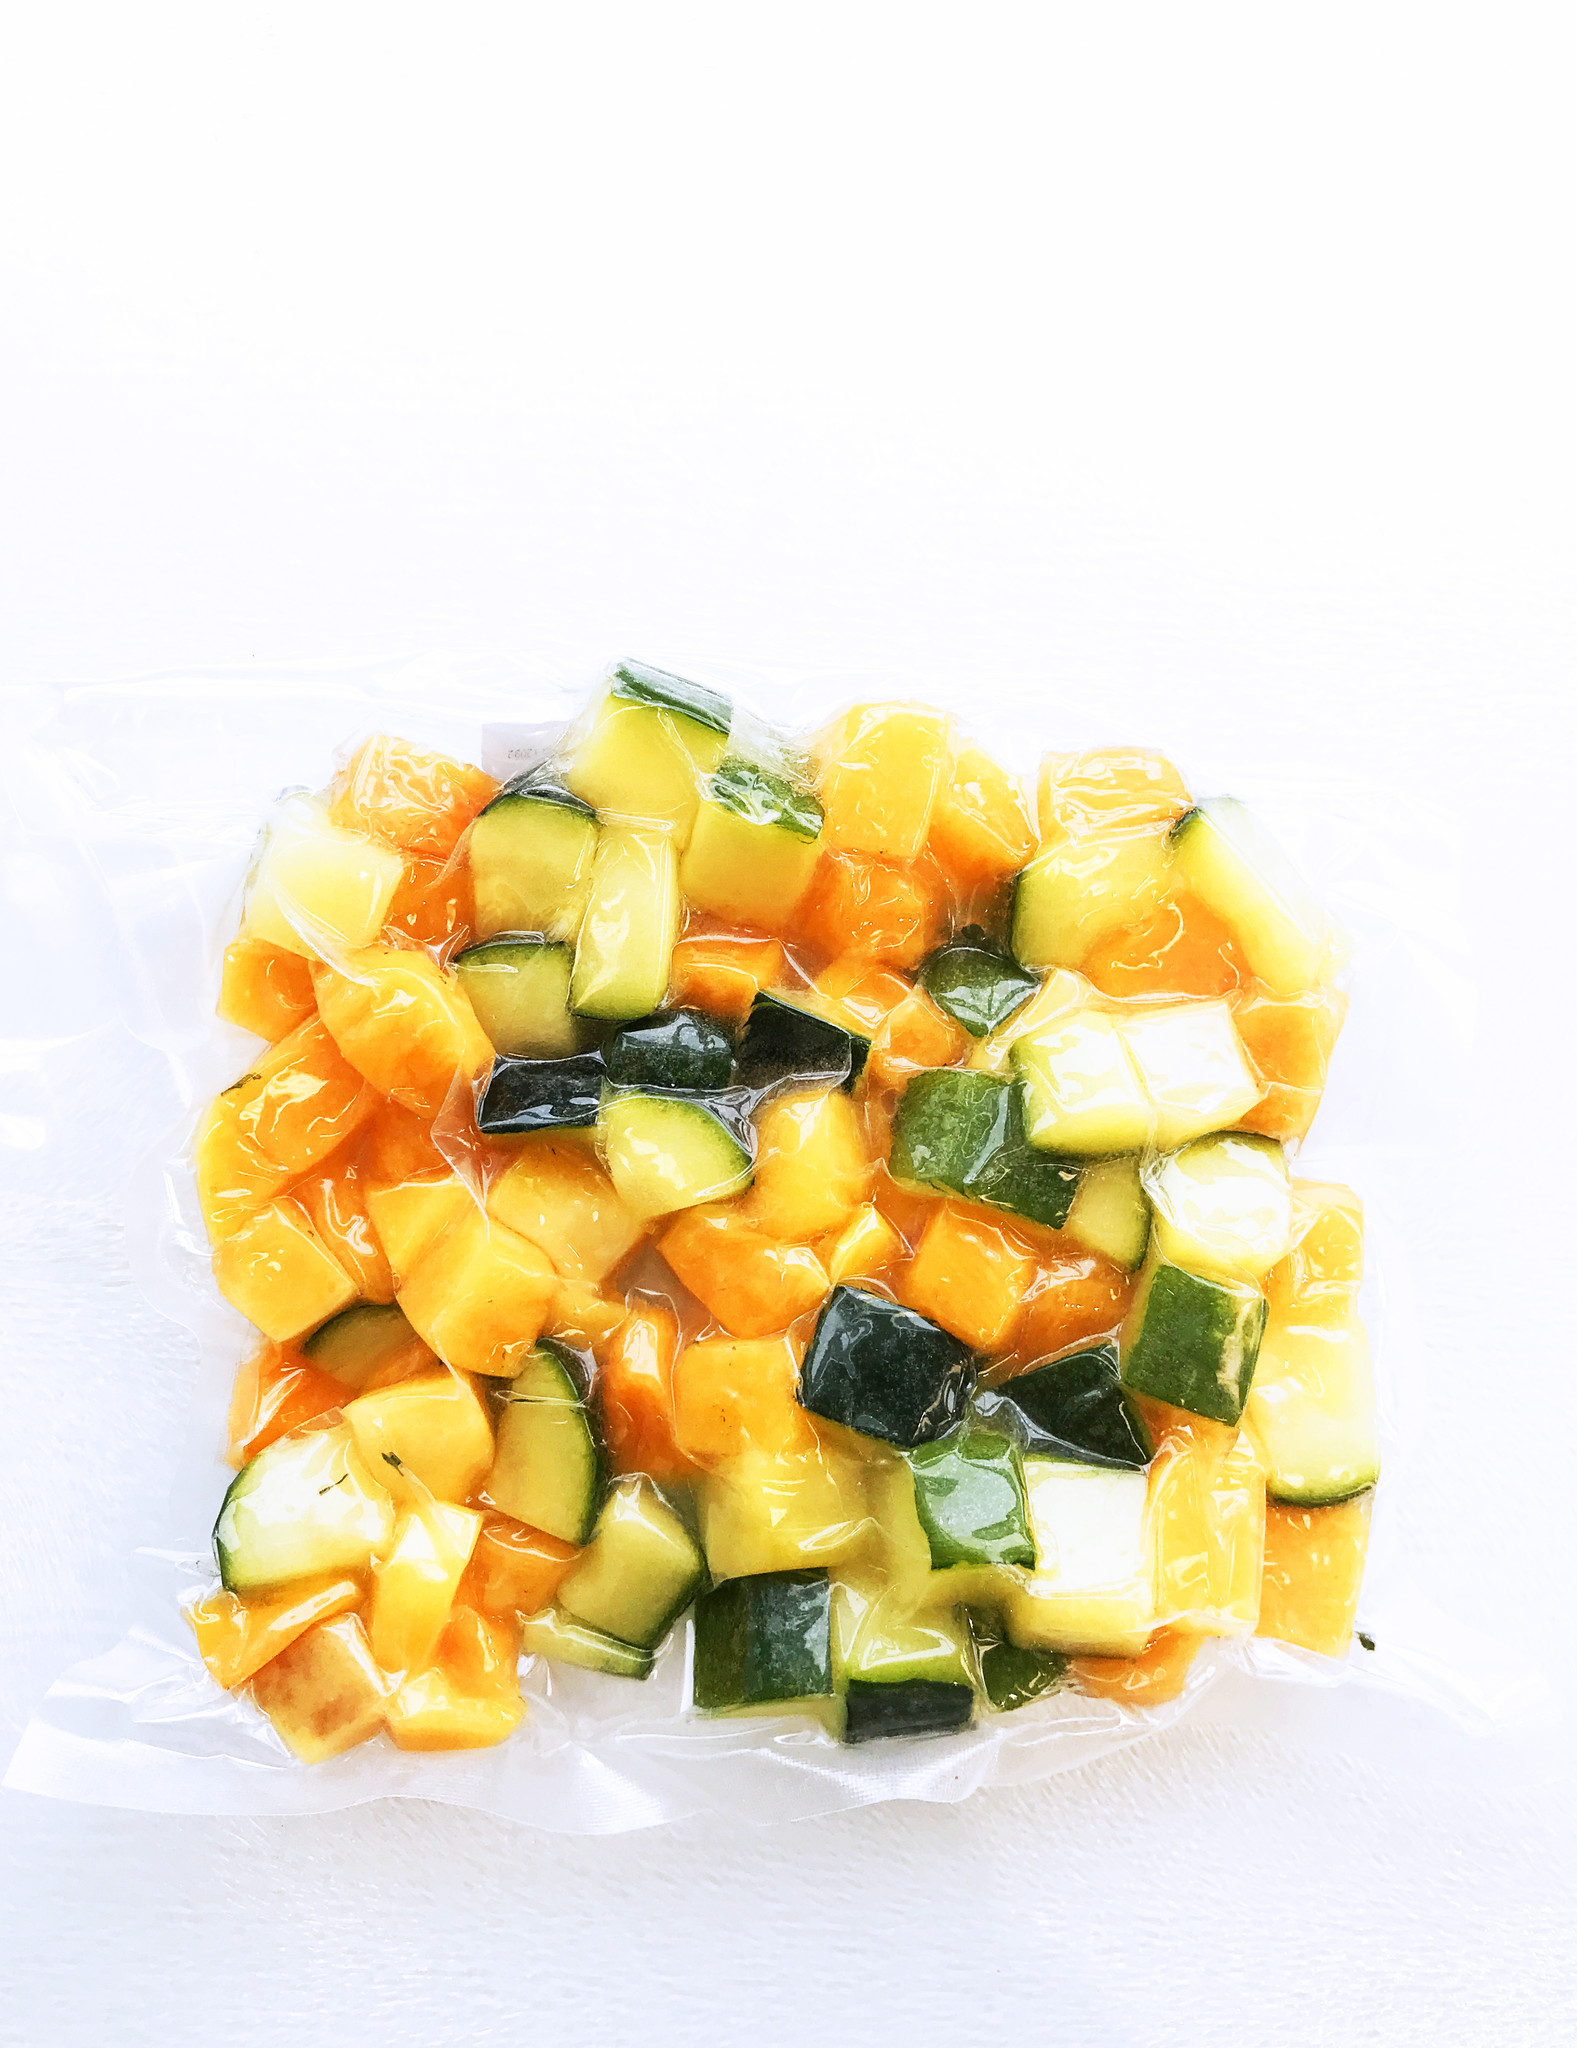 Butternut squash & green squash